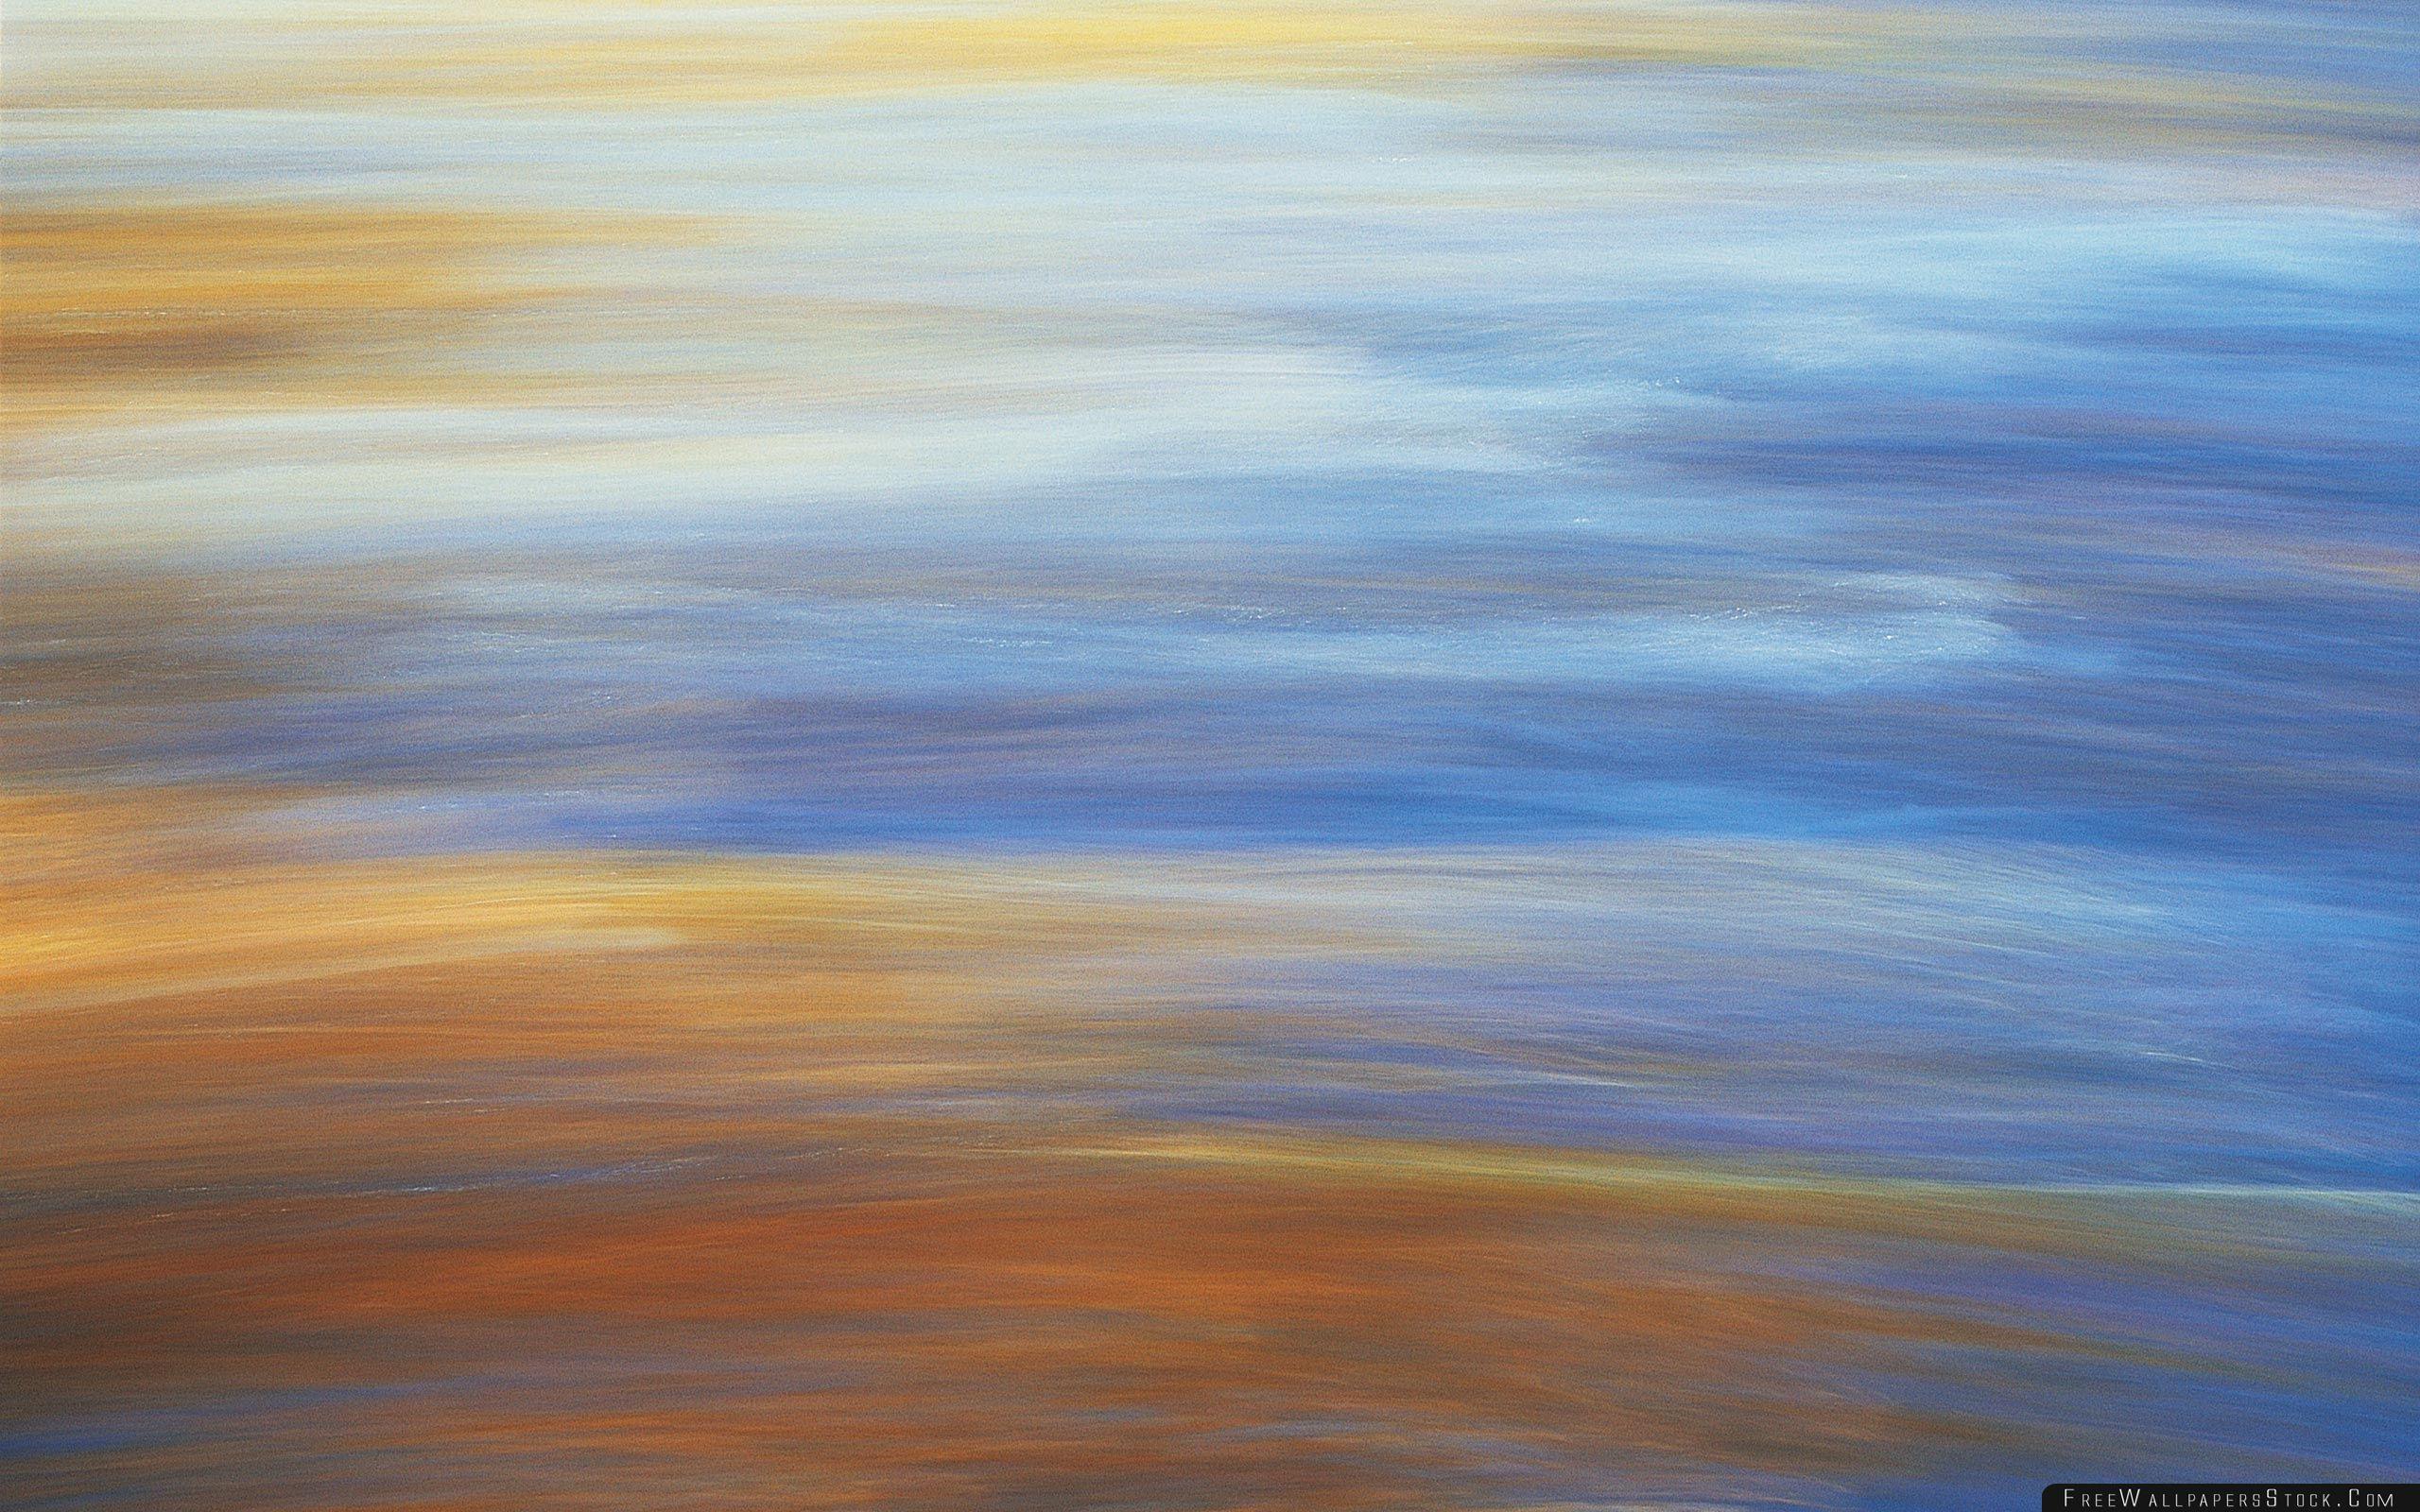 Download Free Wallpaper Water Surface